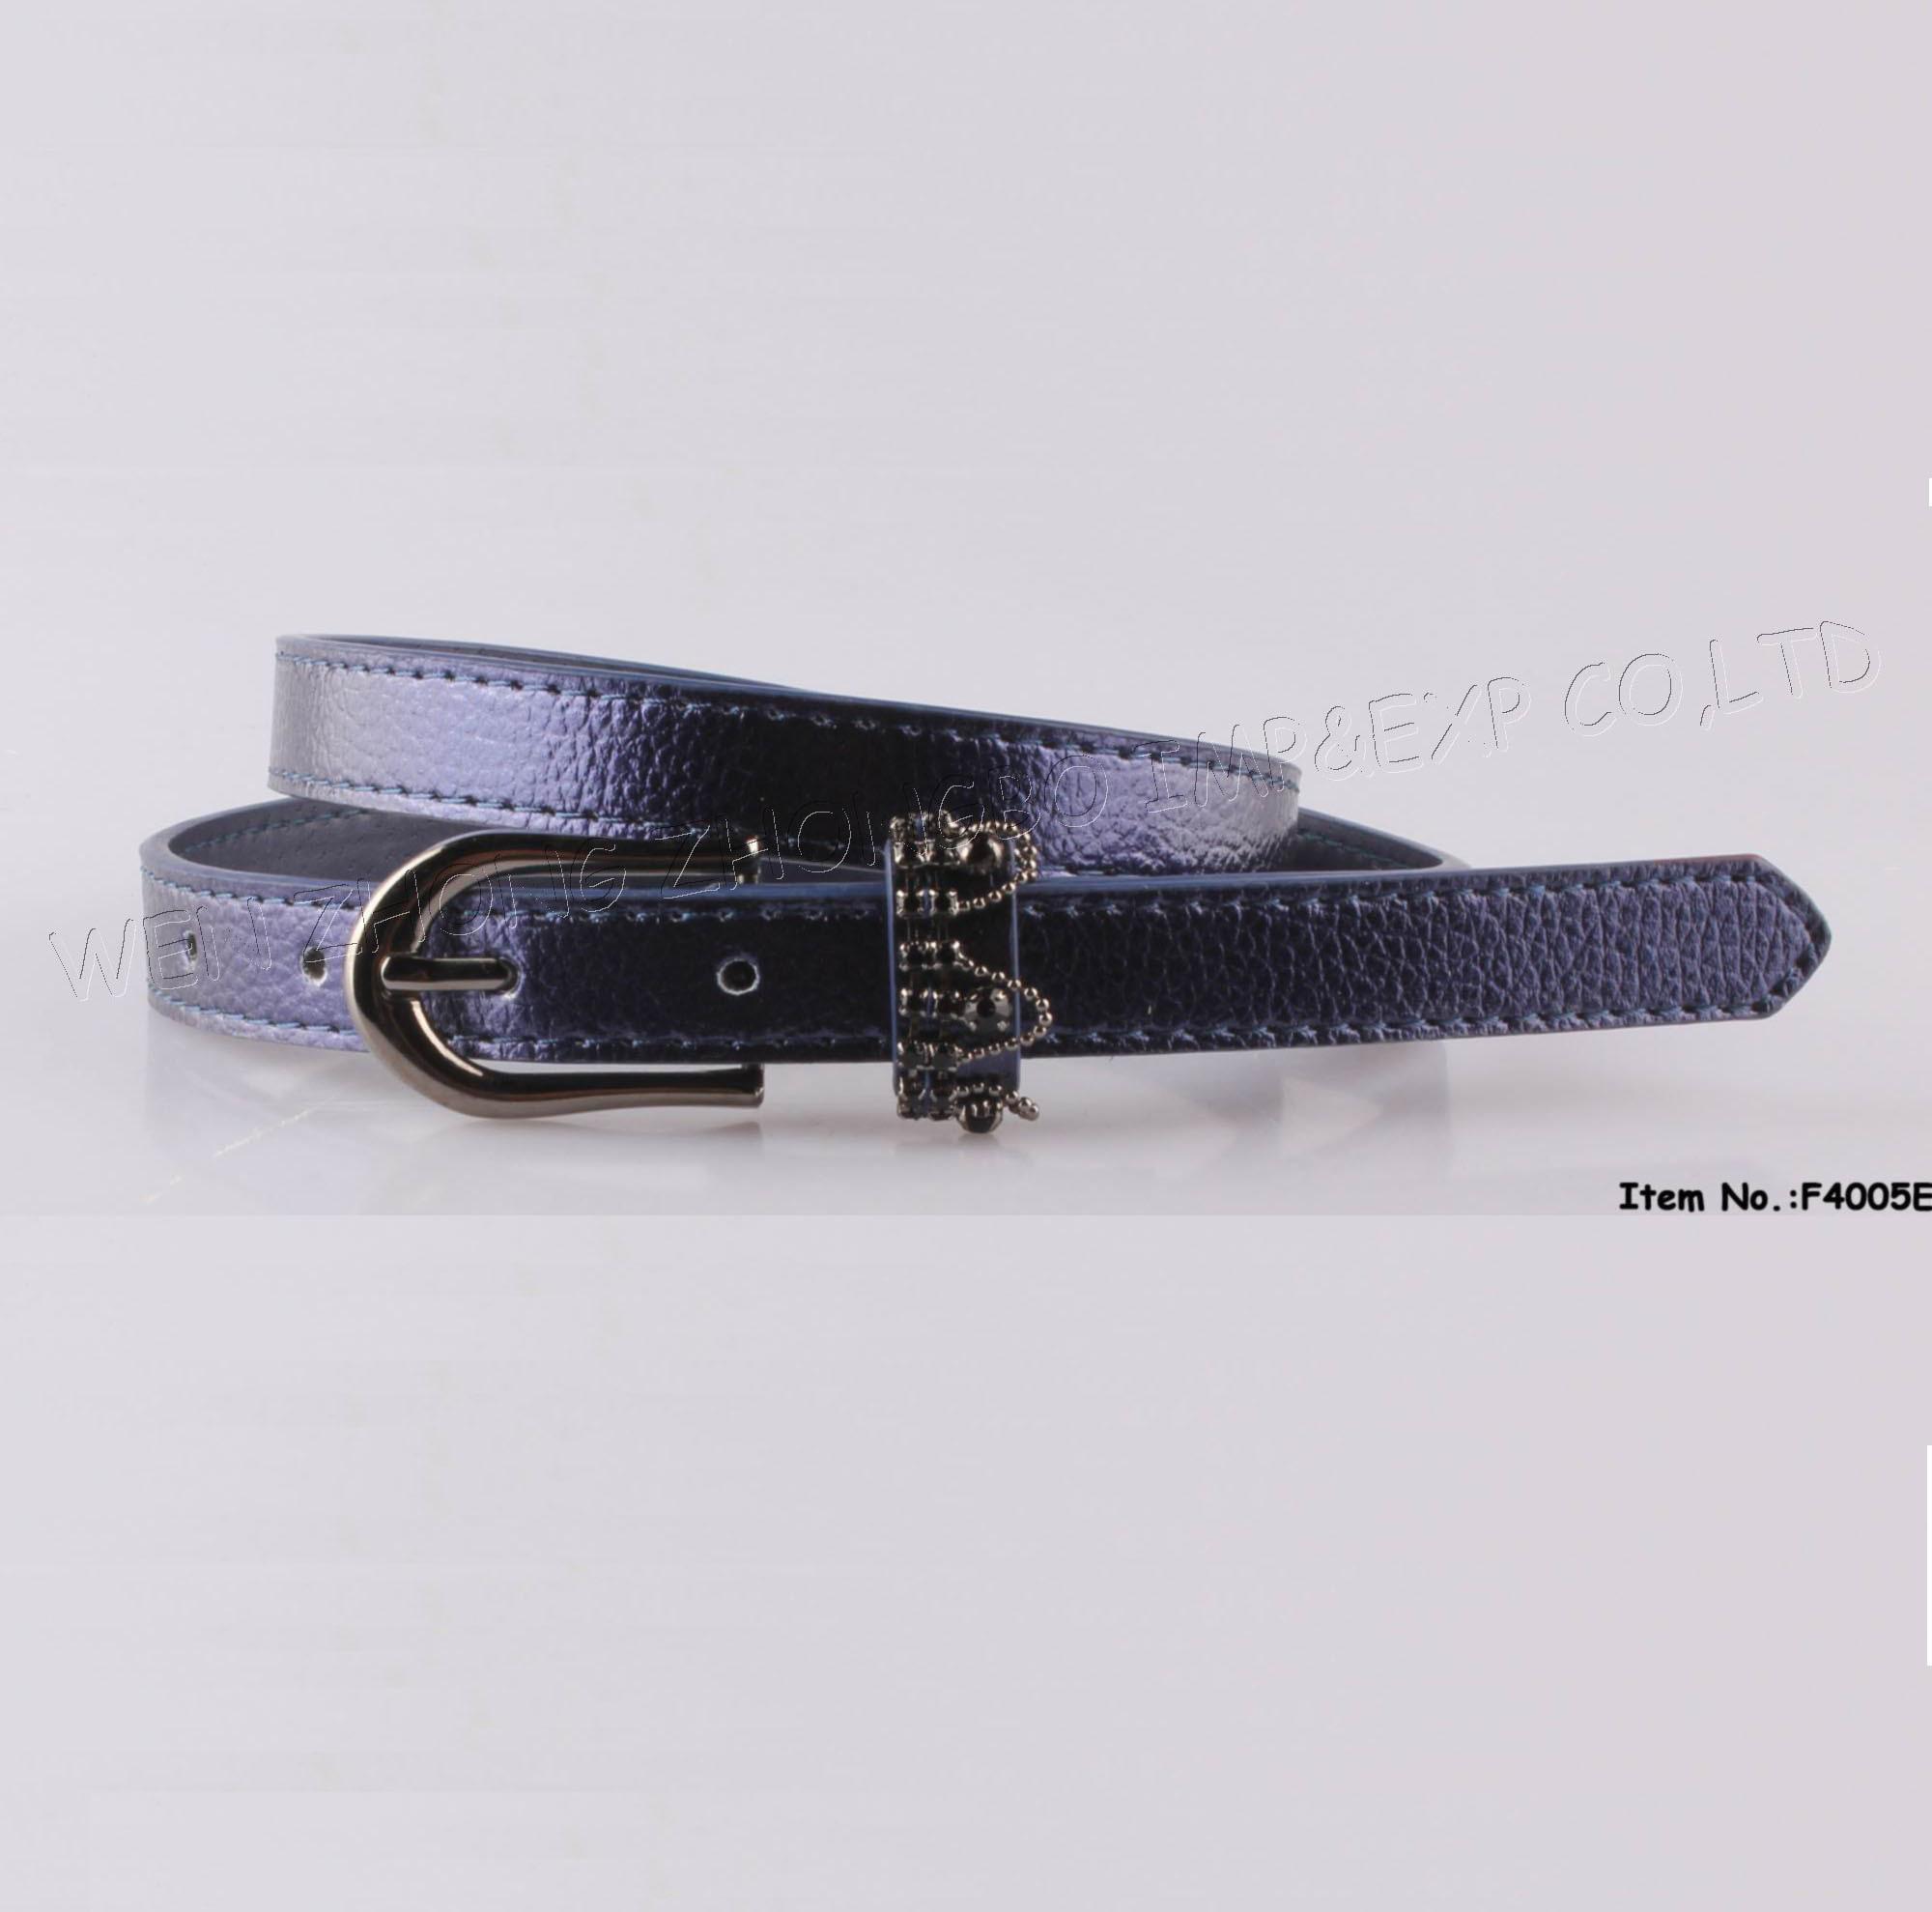 New Leather Fashion Women Belts with PU